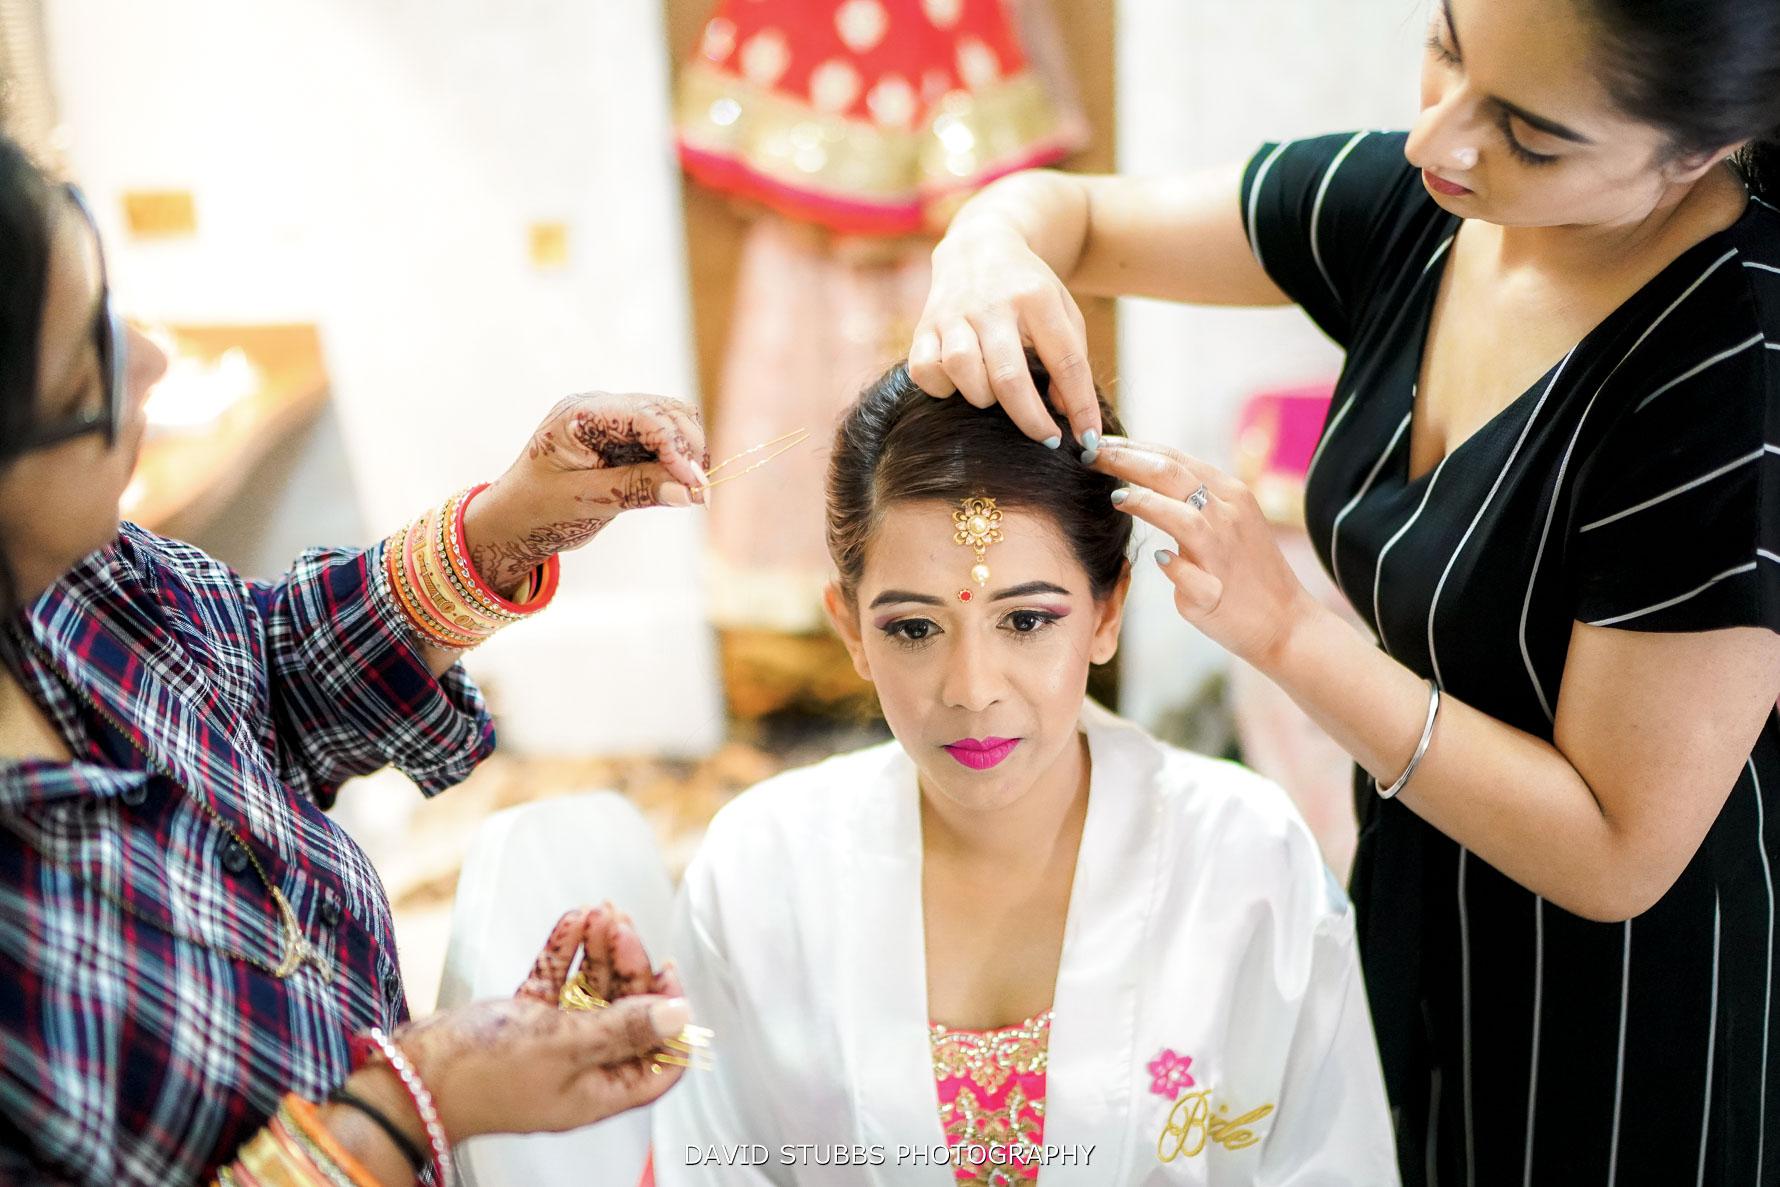 Indian wedding dress put on her head